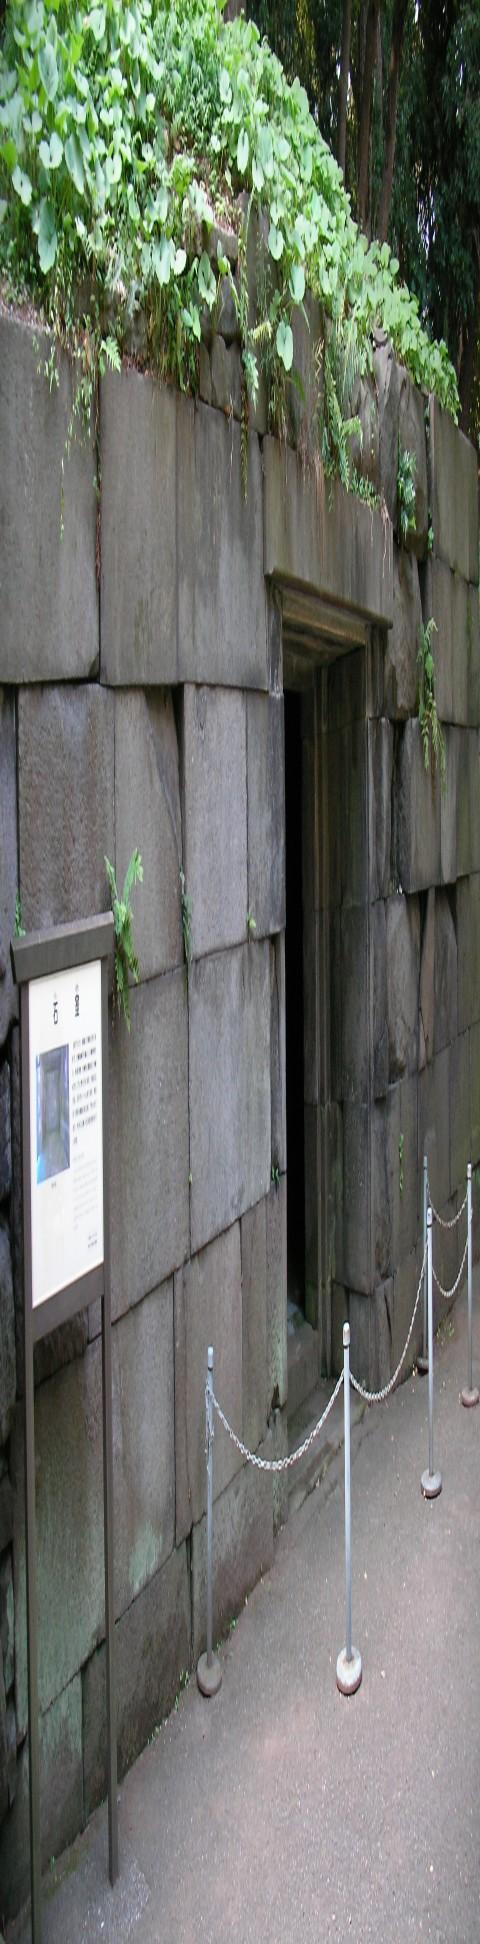 koukyo097.JPG 皇居東御苑 石室